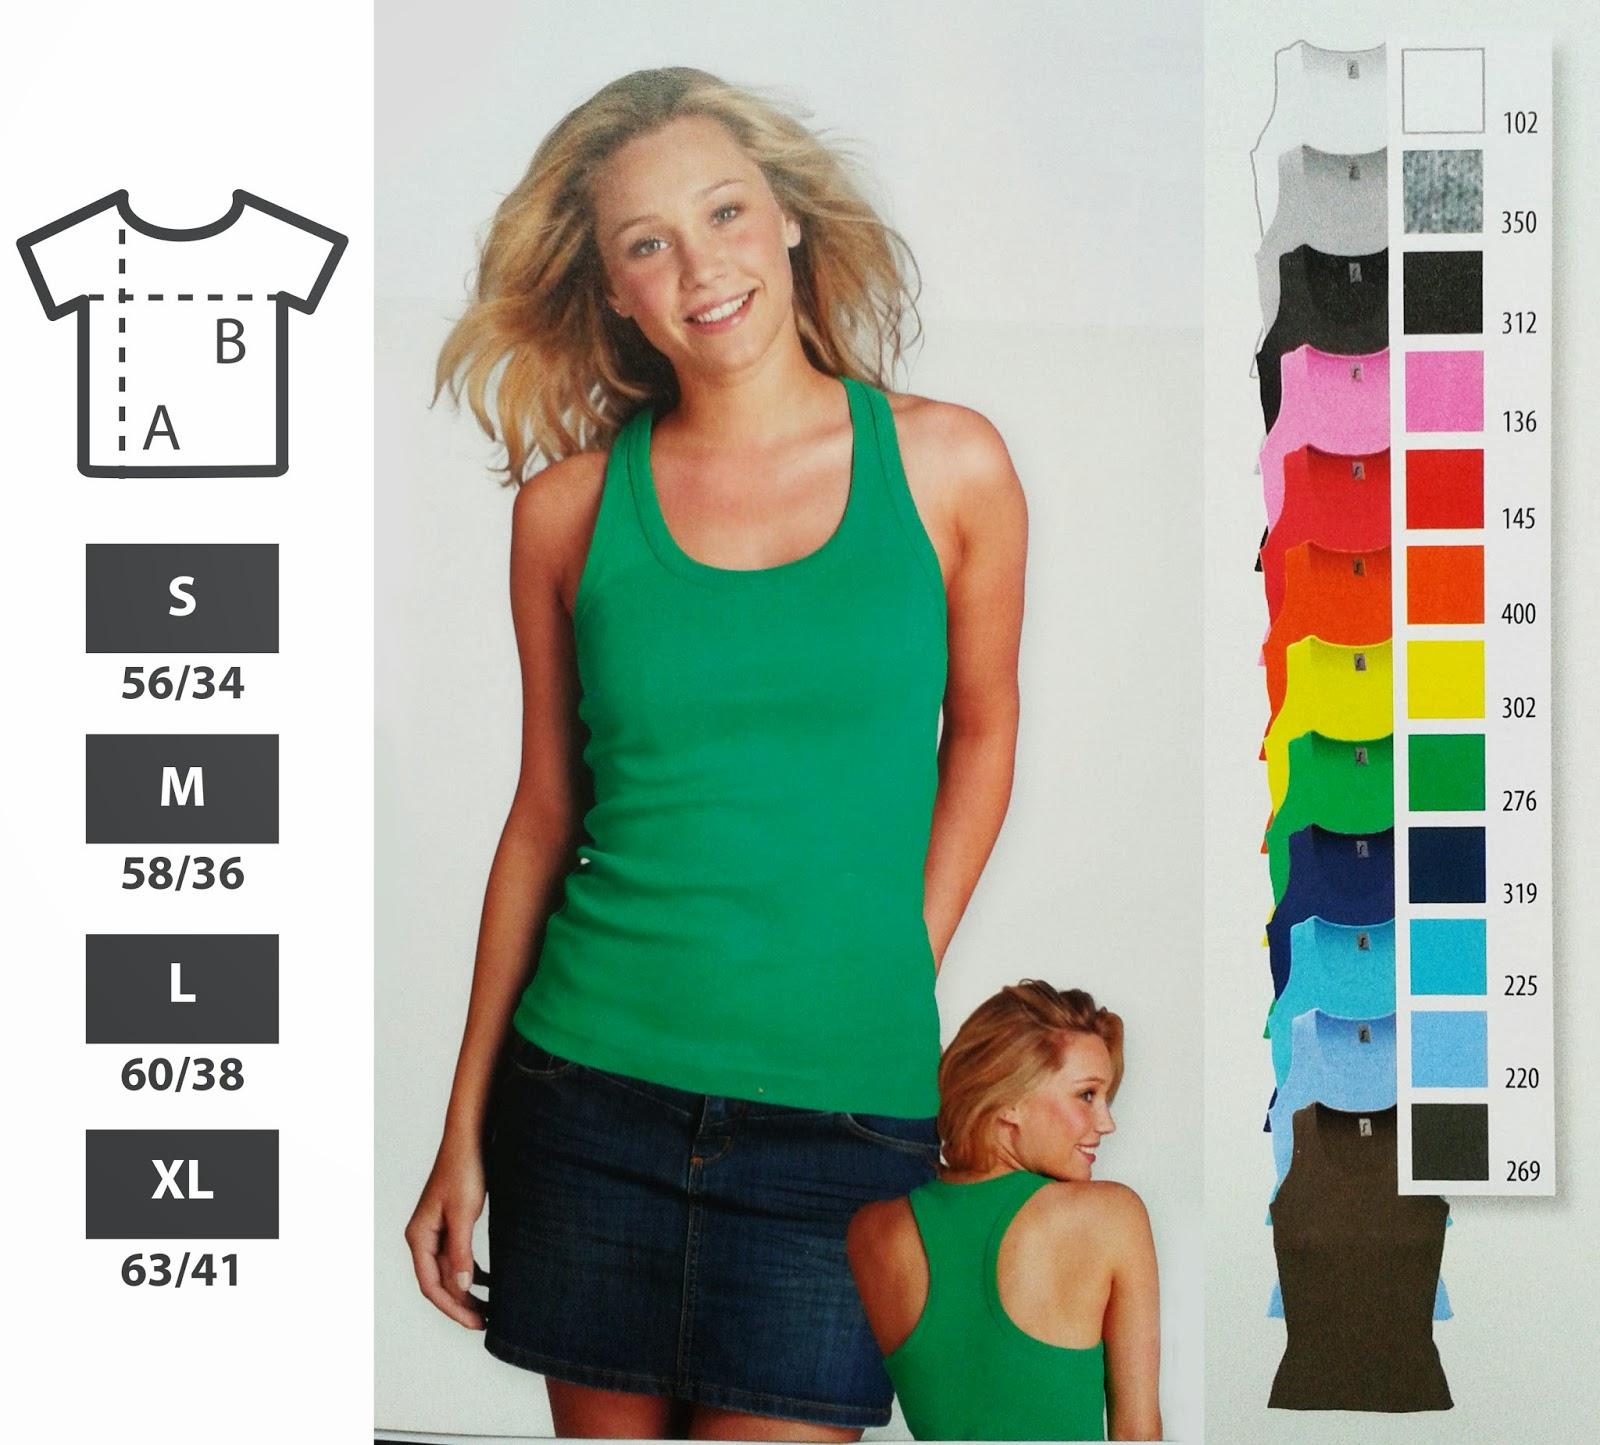 8b81597f042d Γυναικείο μπλουζάκι με αθλητική πλάτη